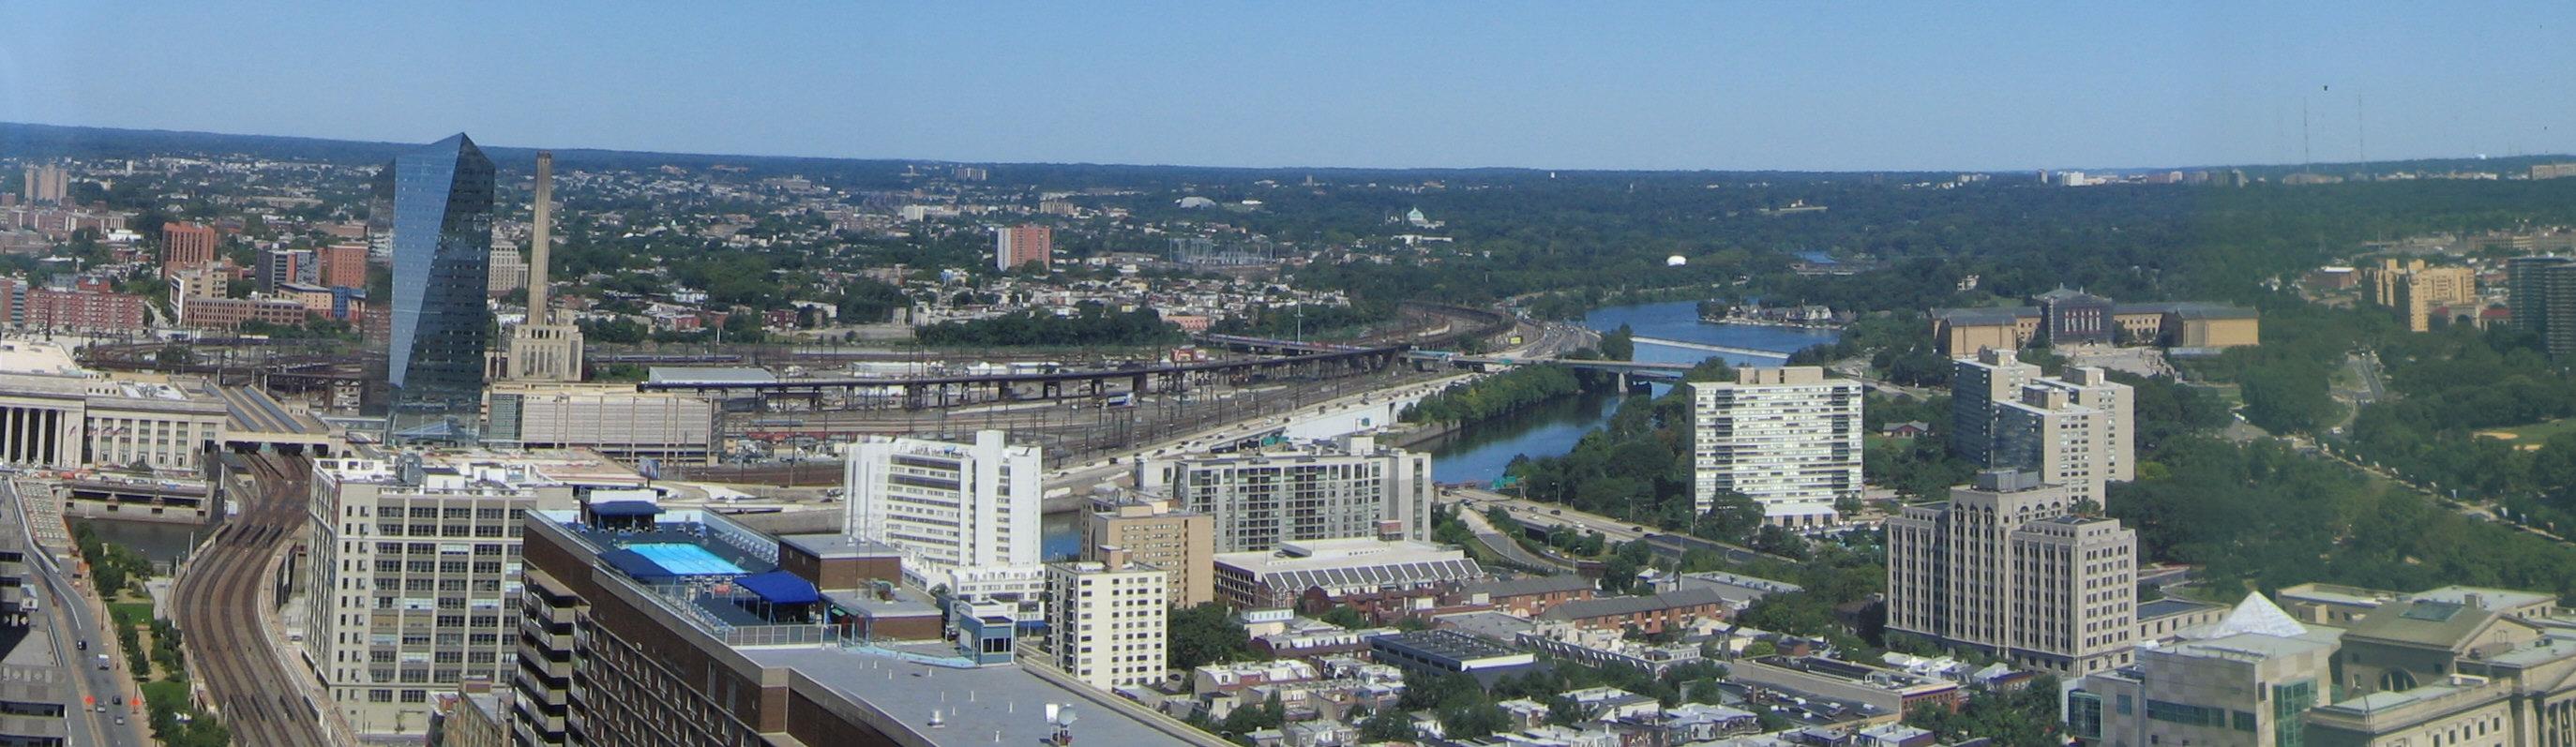 File:Northwest-center-city.jpgnorthwest city